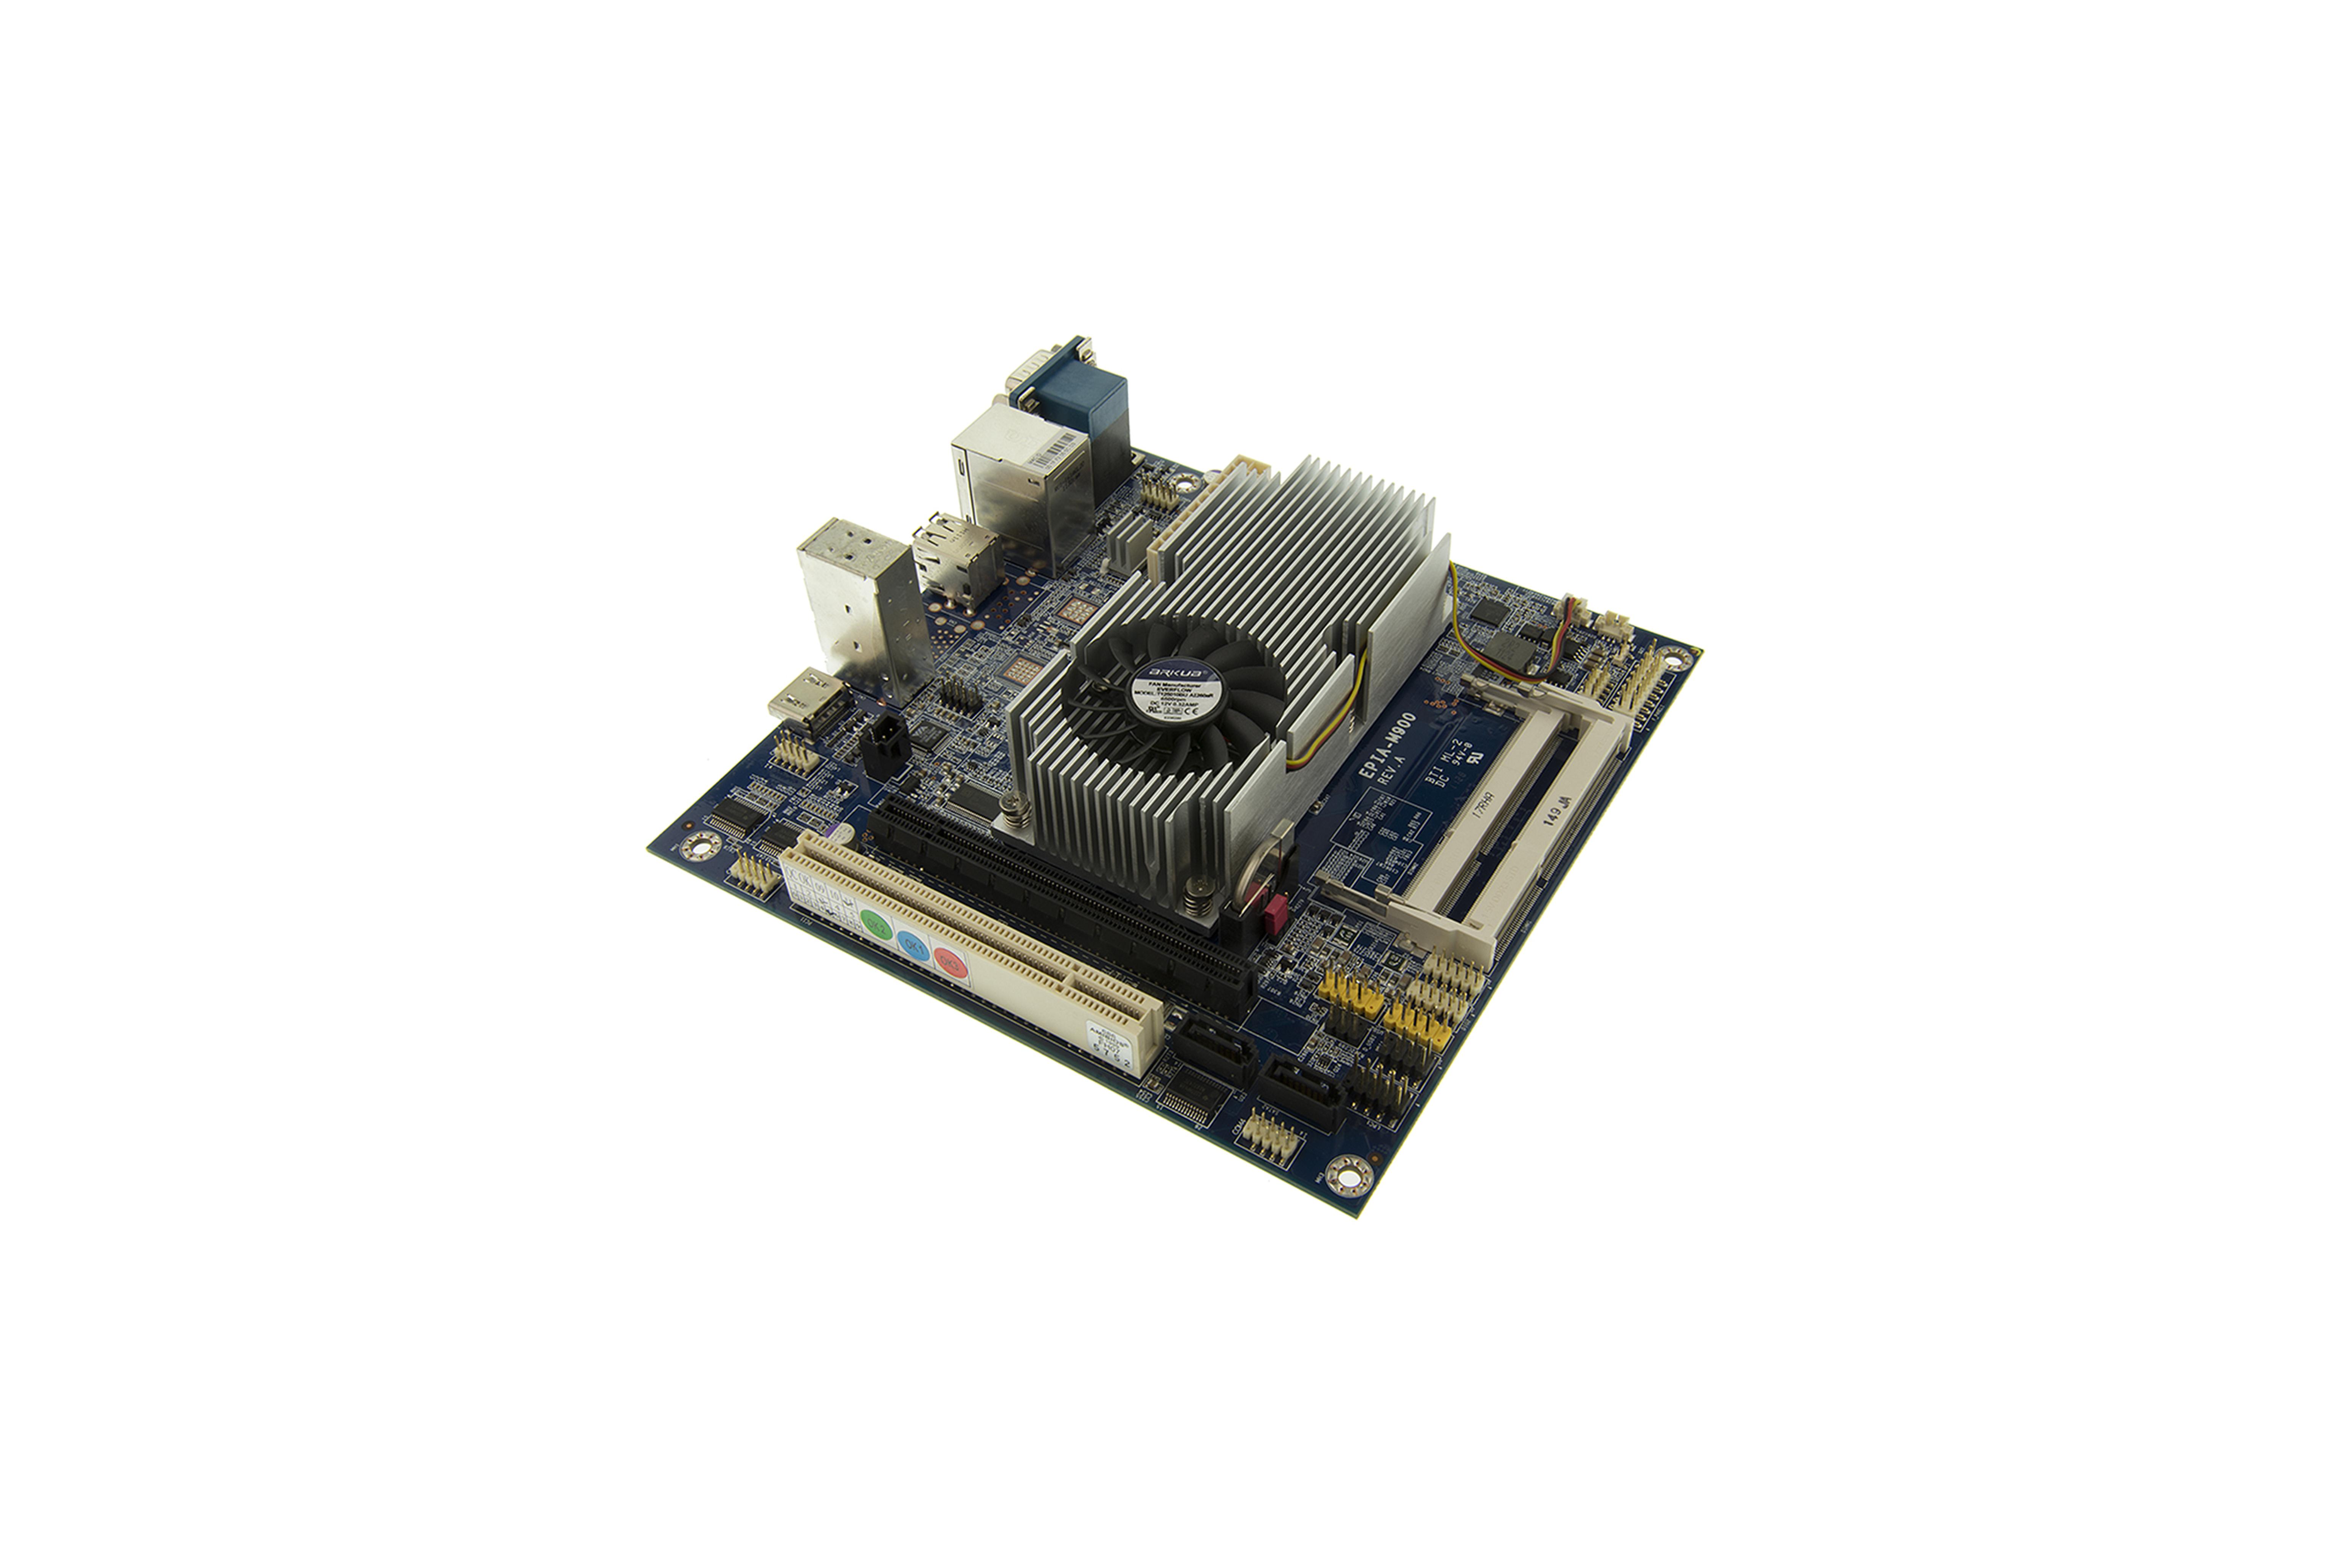 MINI-ITX 1.6 GHZ VIA NANO X2 DUALCORE HD